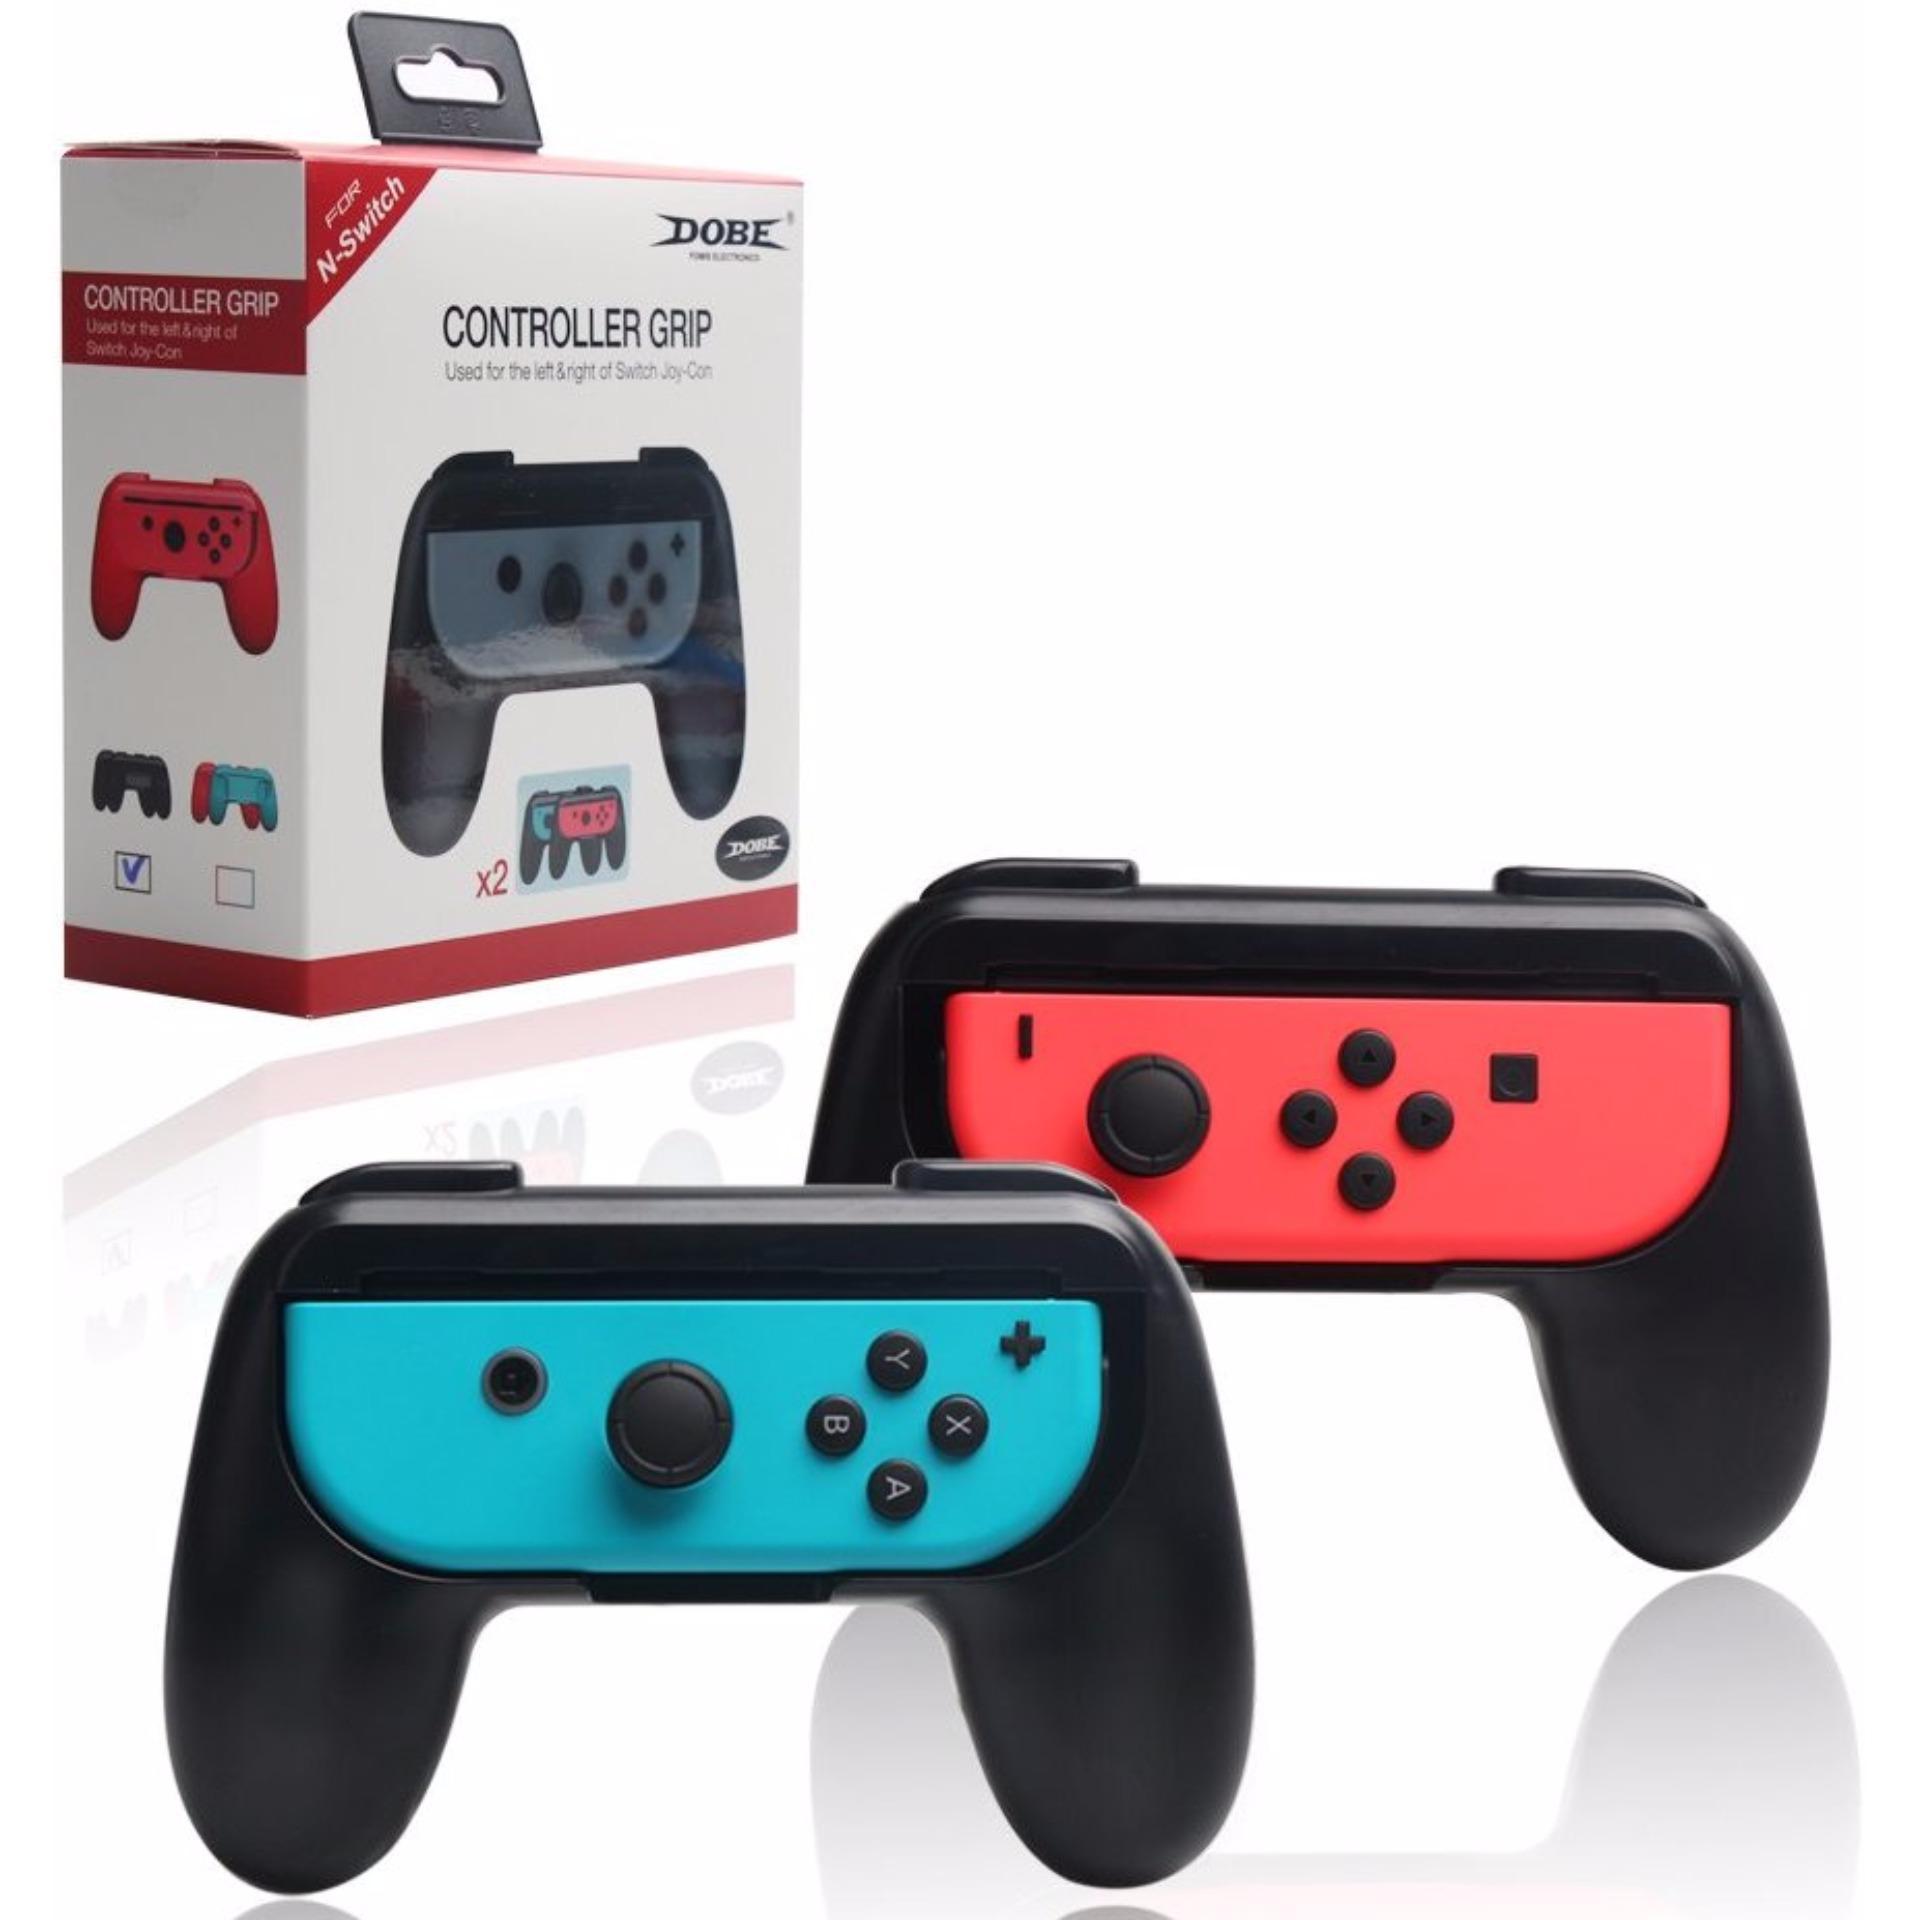 (2-PACK) DOBE Joy-Con Grip Kit for Nintendo Switch , High Quality Wear-resistant Joy con Handle Holder for Nintendo Switch (Black+Black)